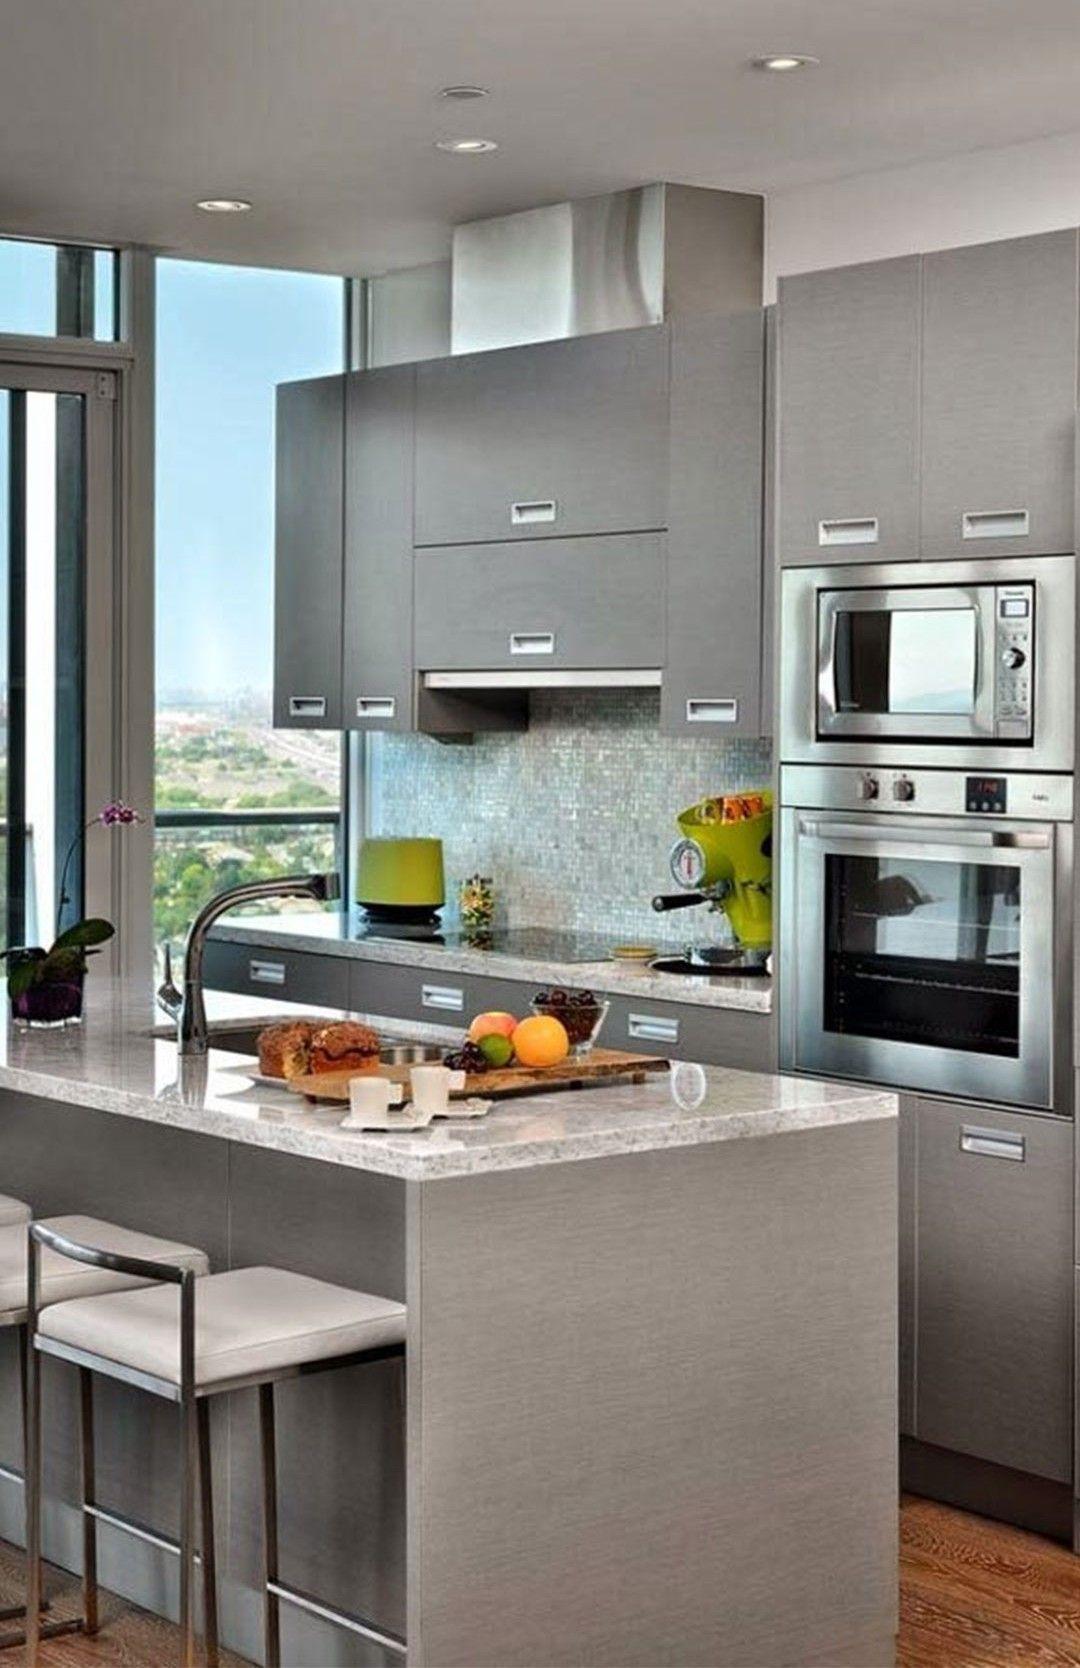 Small Kitchen Design Ideas 2014 Picture | Kitchens | Small ...